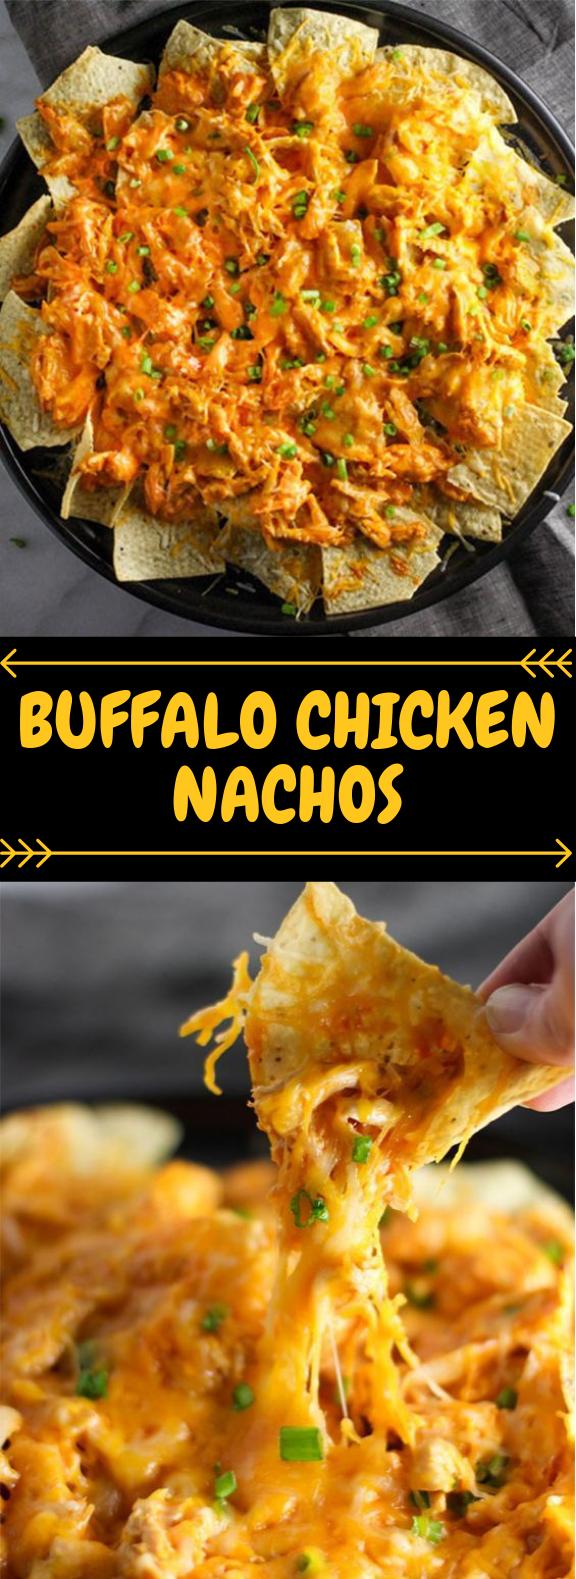 Buffalo Chicken Nachos #Appetizer #EasyRecipe